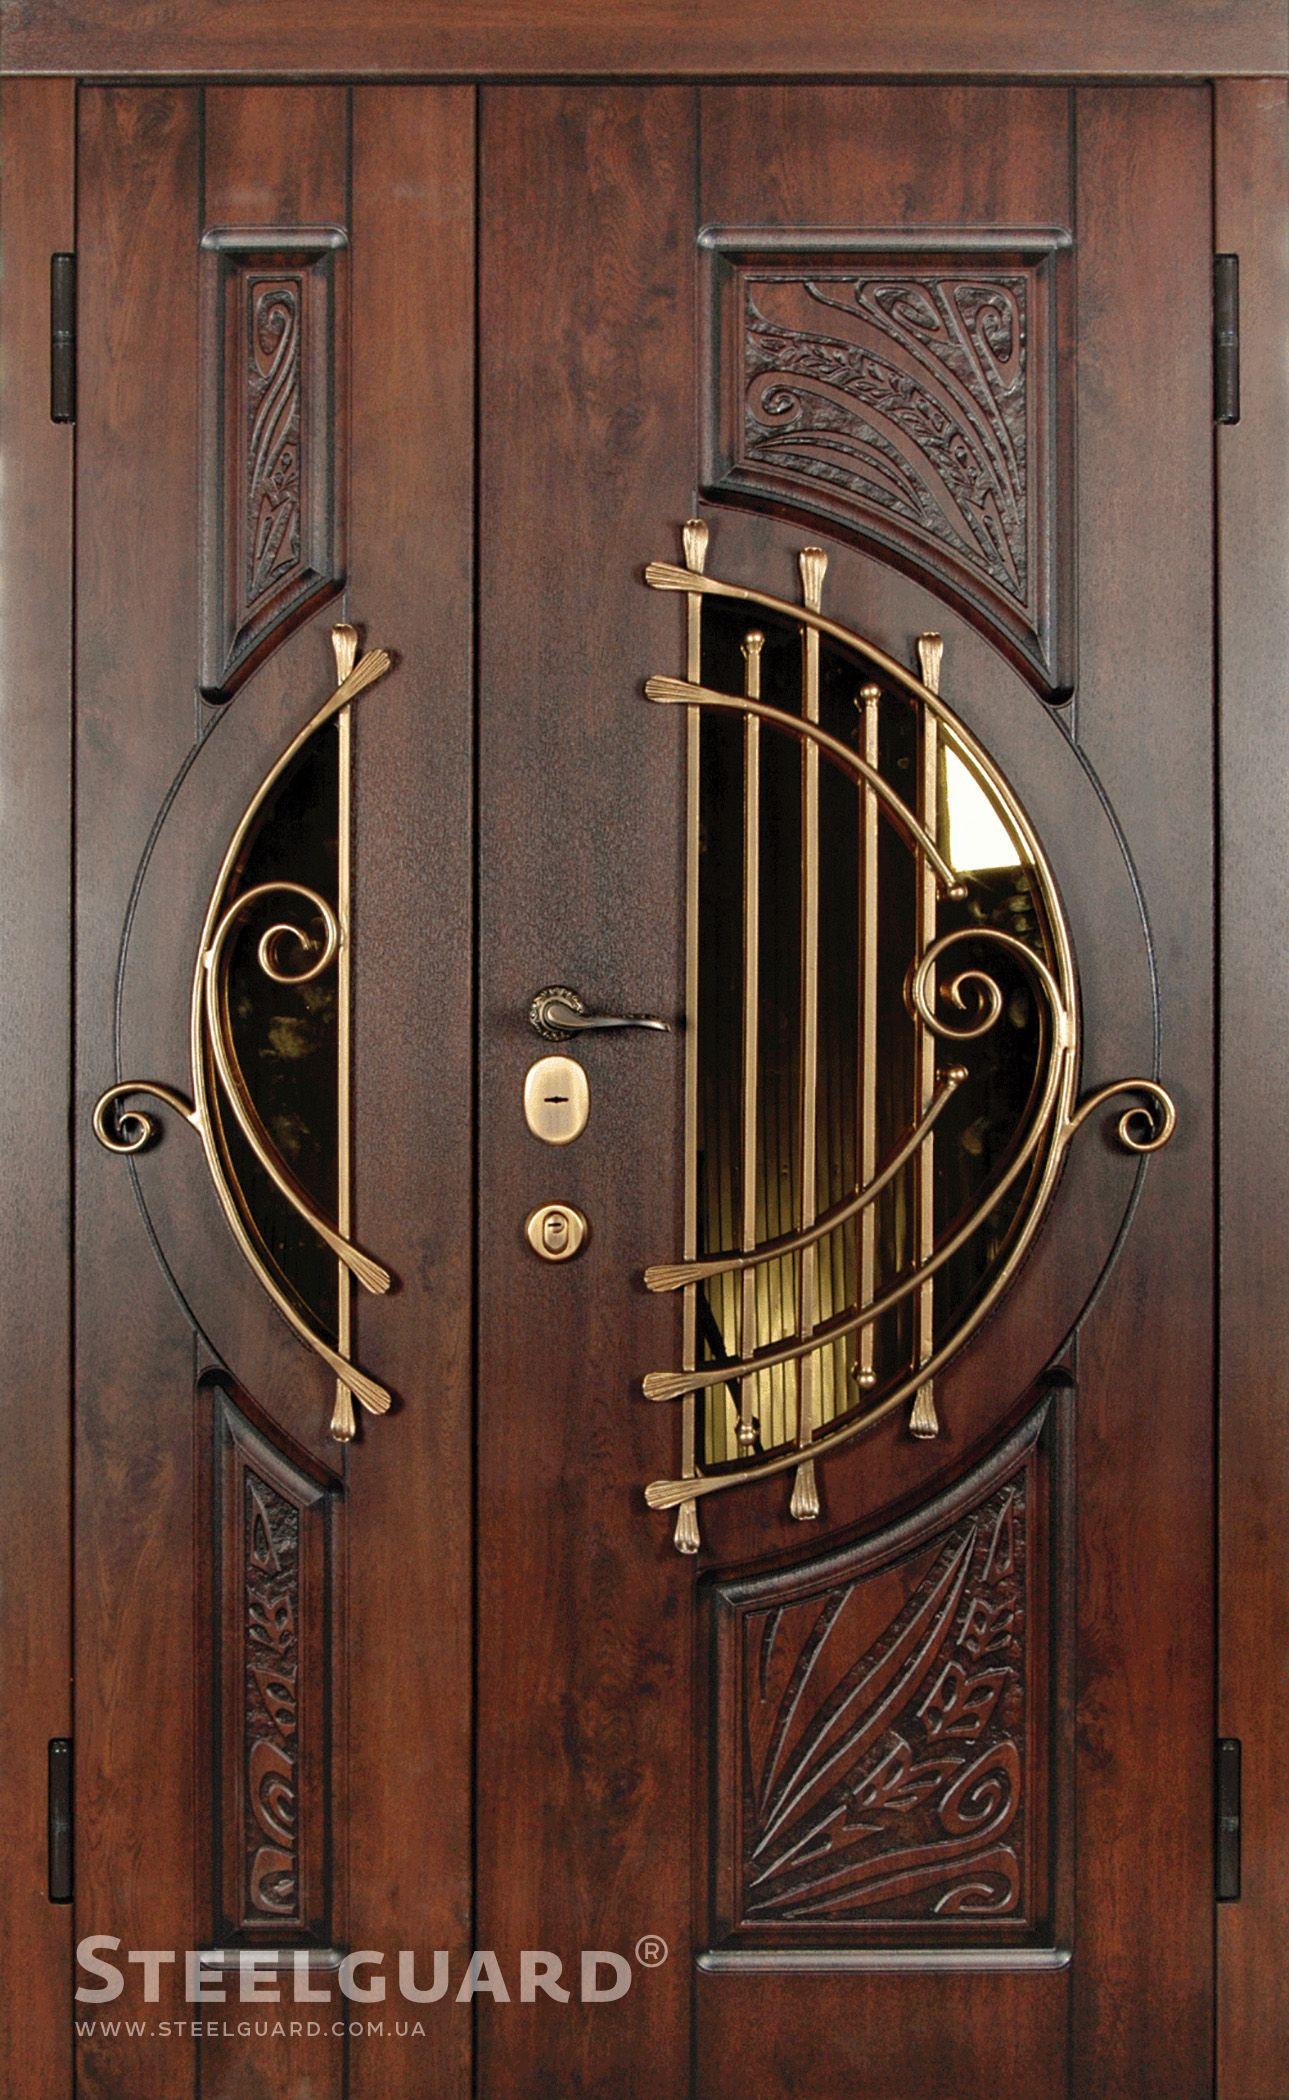 Ardurvis Majai Un Dzivoklim Akolat Buvmaterialu Interneta Veikals Wooden Main Door Wooden Door Design Wooden Main Door Design